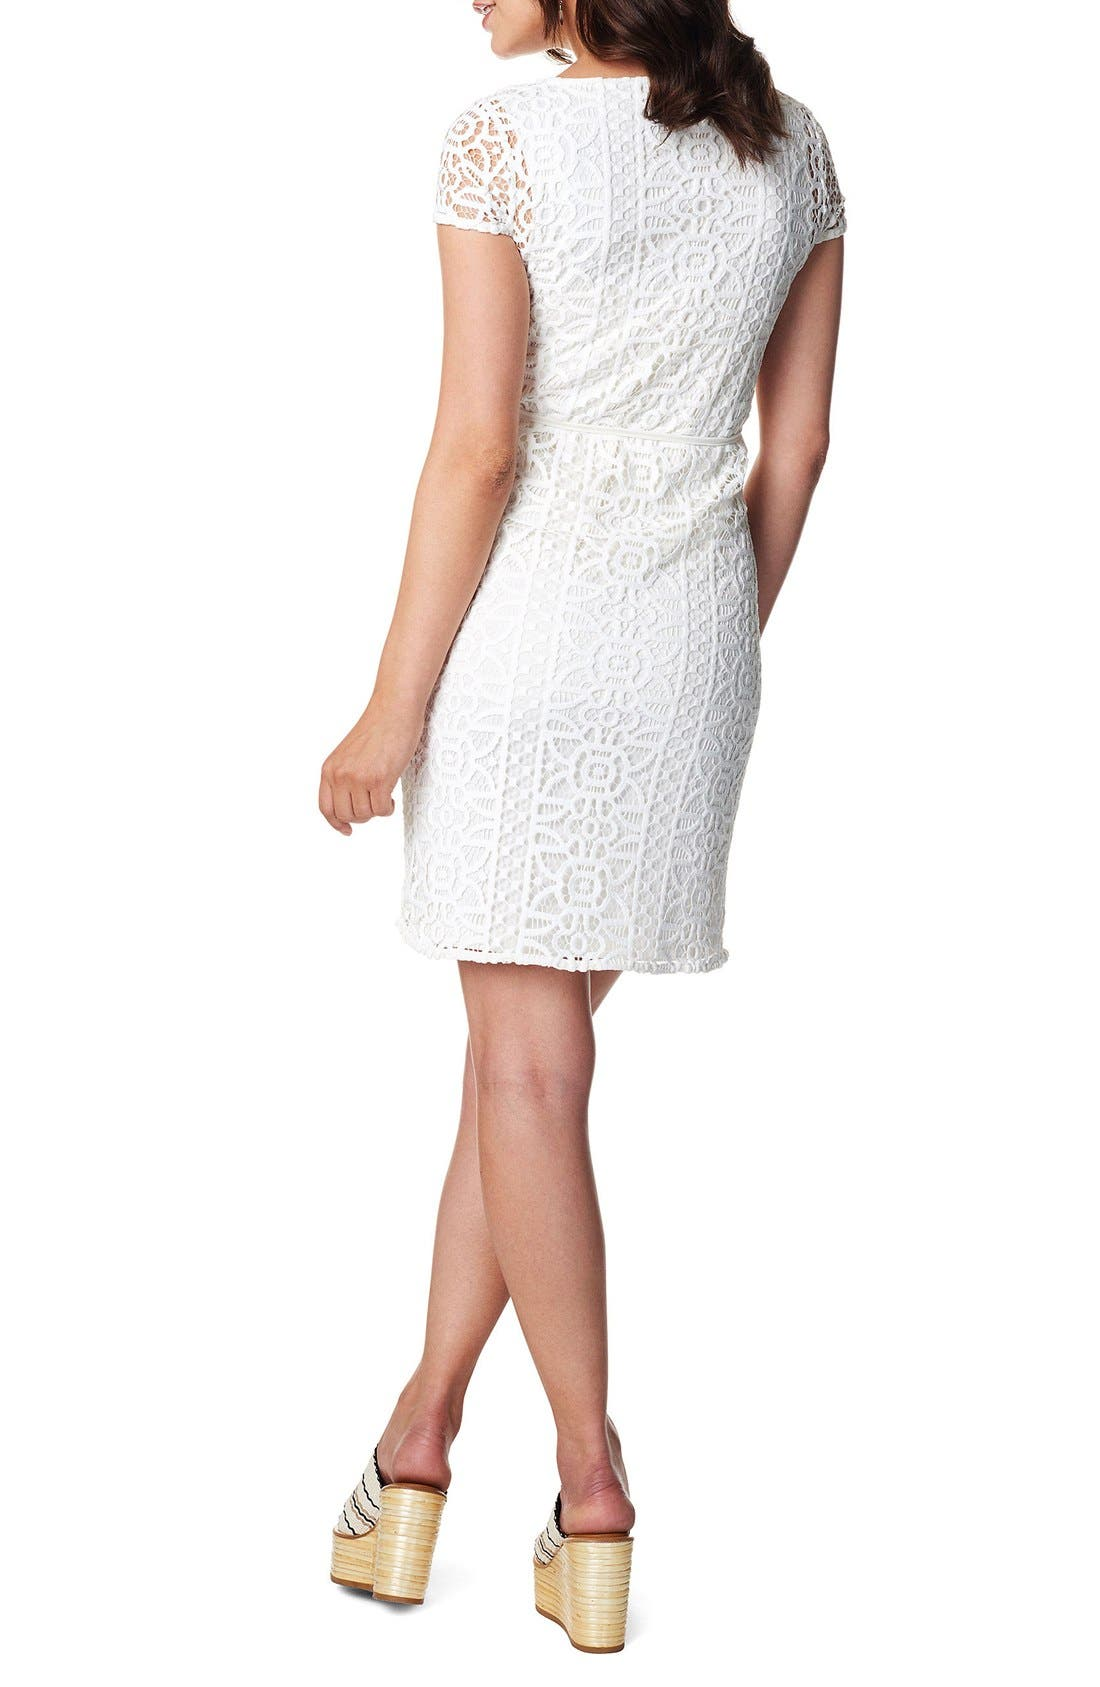 Elise Woven Lace Maternity Dress,                             Alternate thumbnail 2, color,                             OFF WHITE